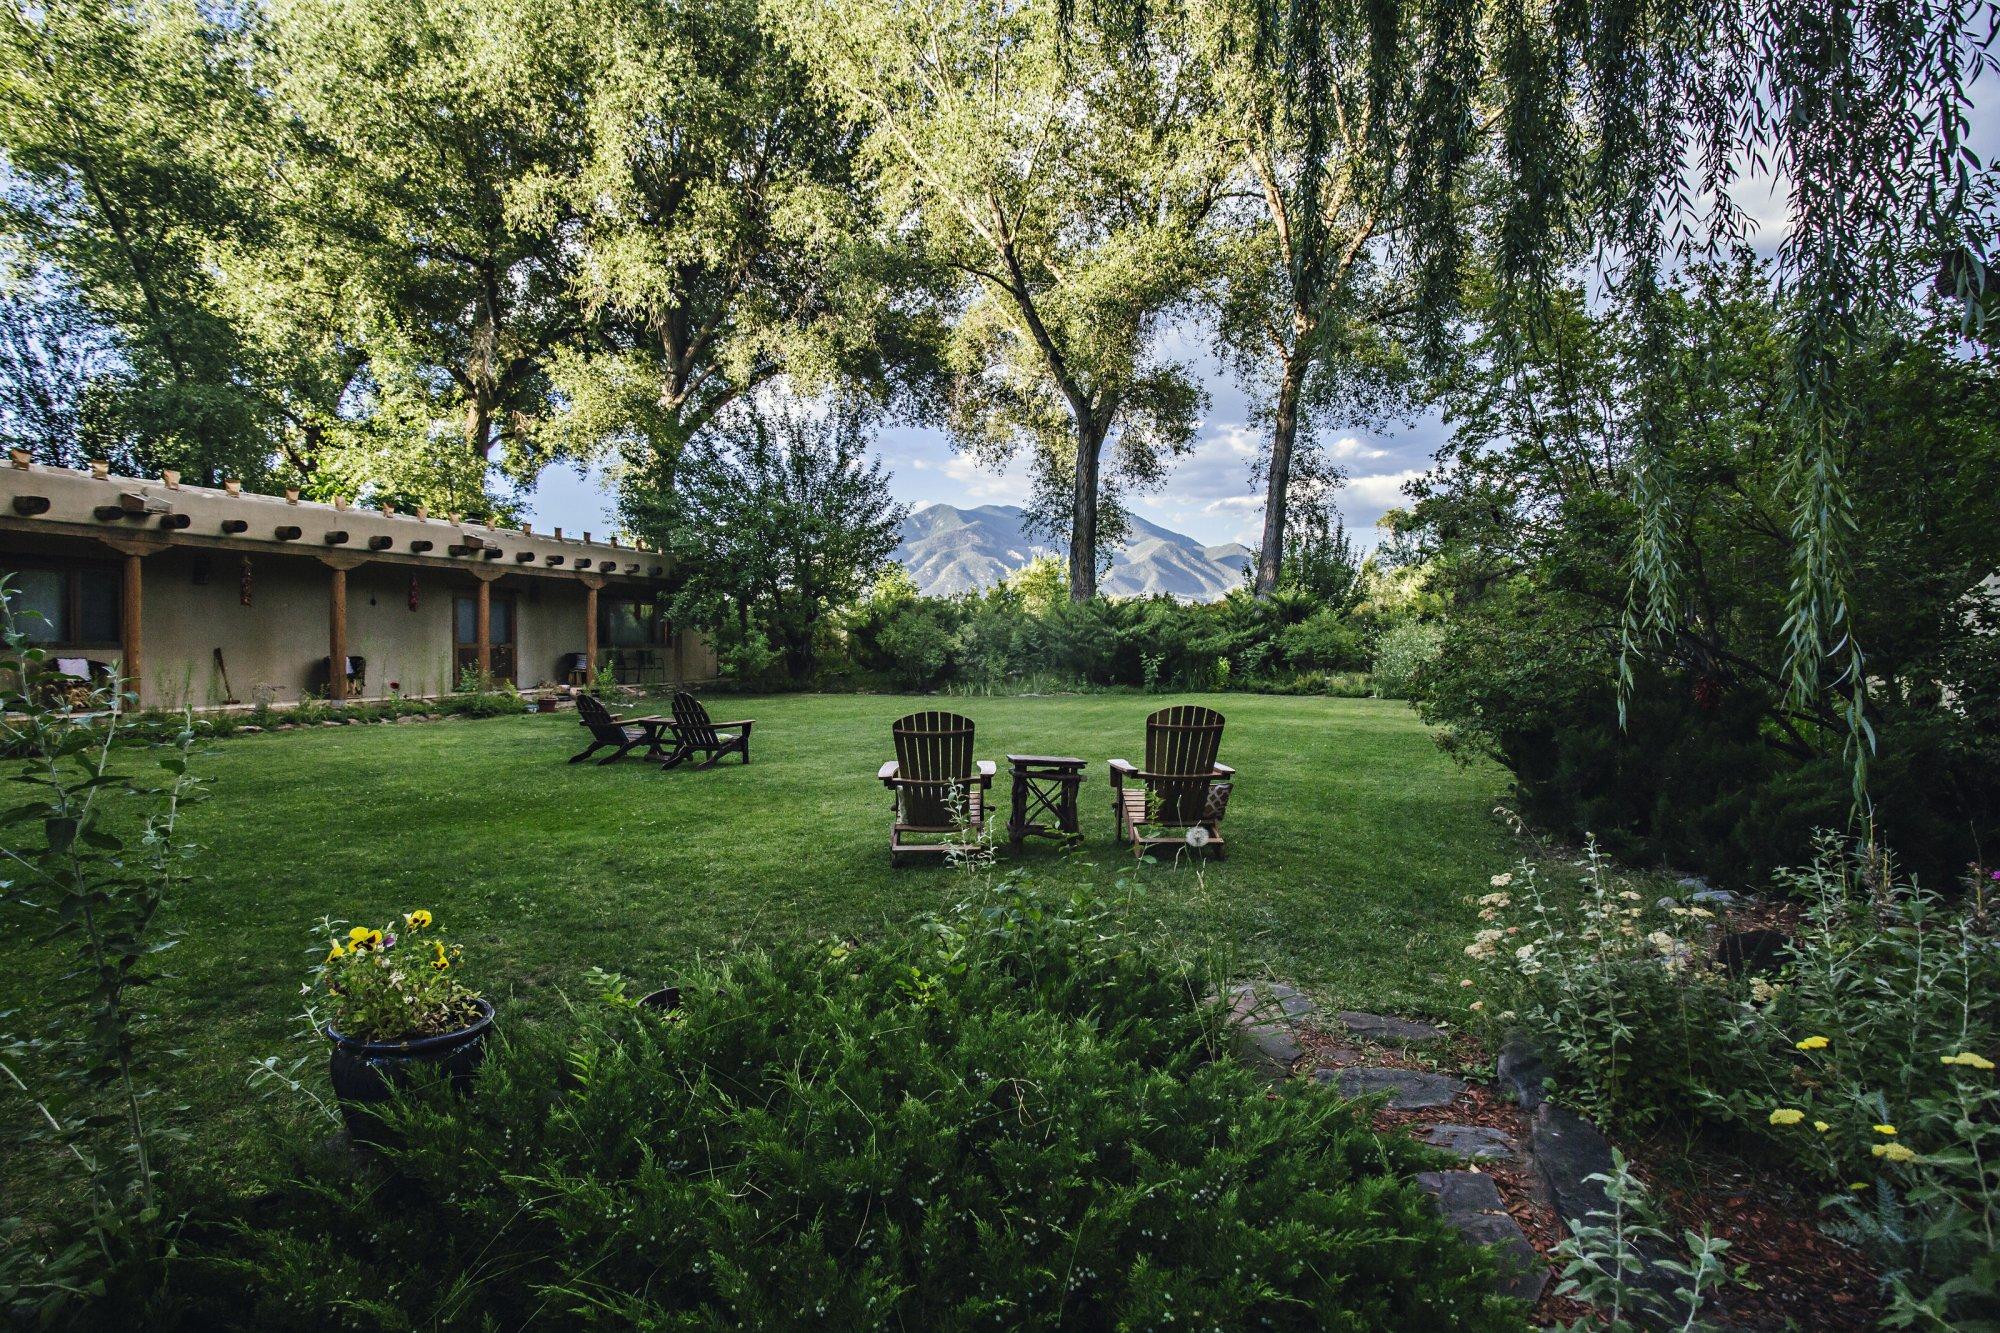 Adobe room at Hacienda del Sol in Taos, NM